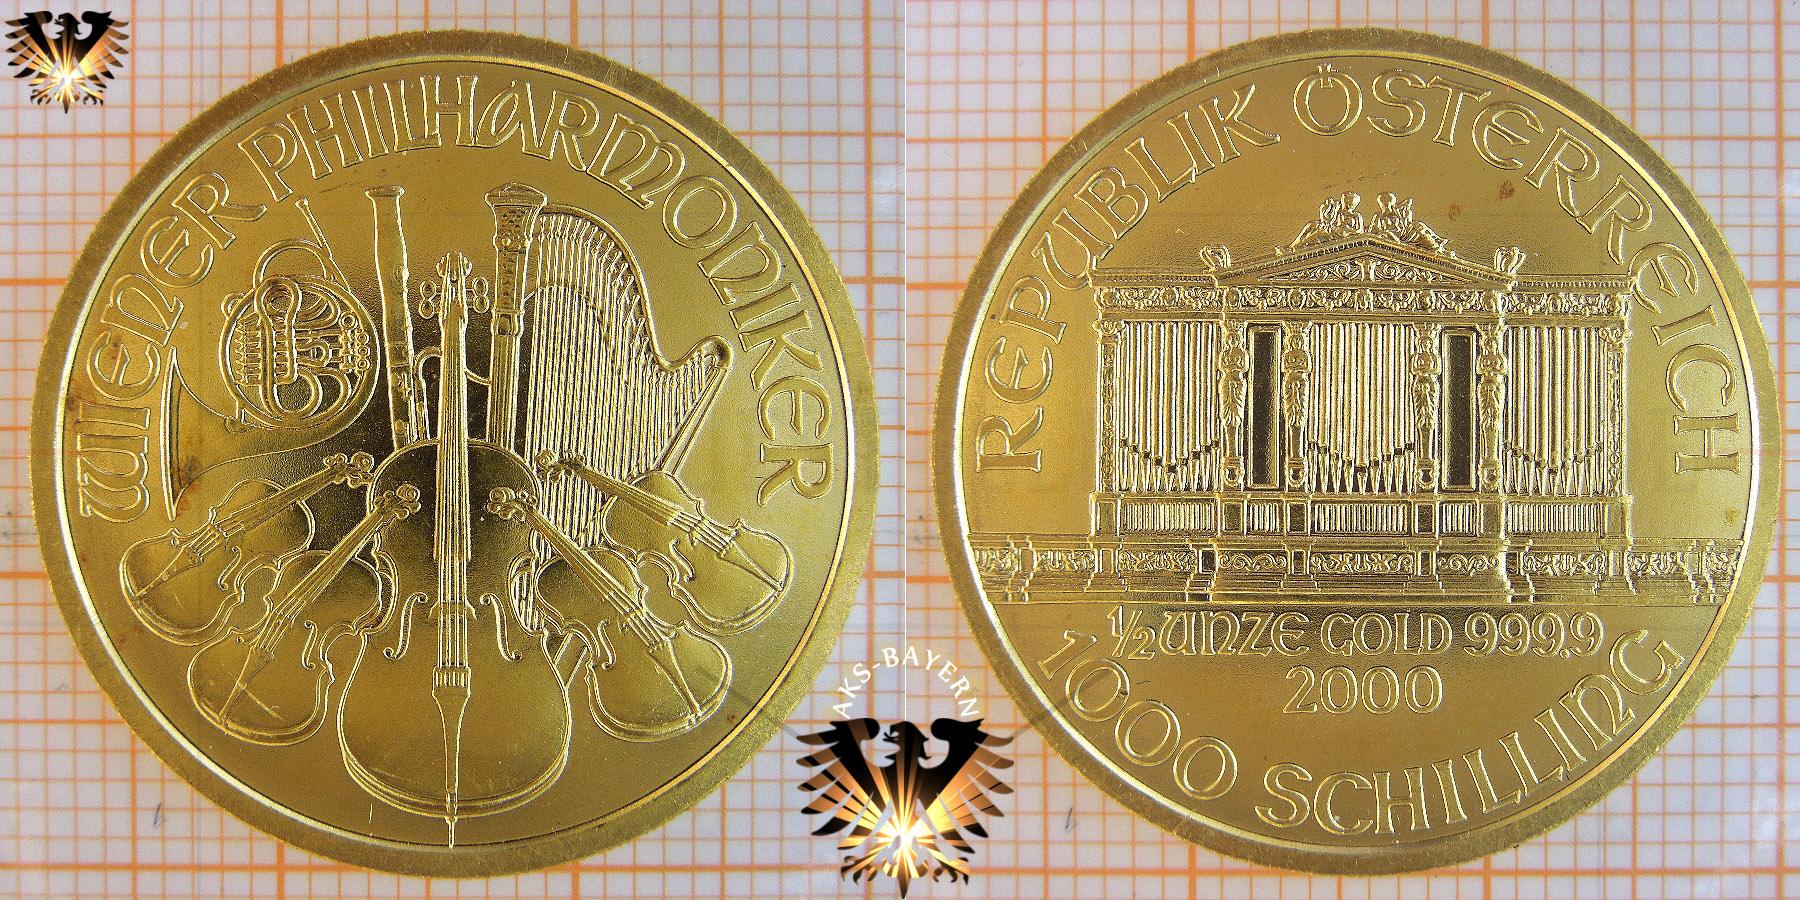 1000 Schilling österreich 2000 Wiener Philharmoniker Halbe Unze